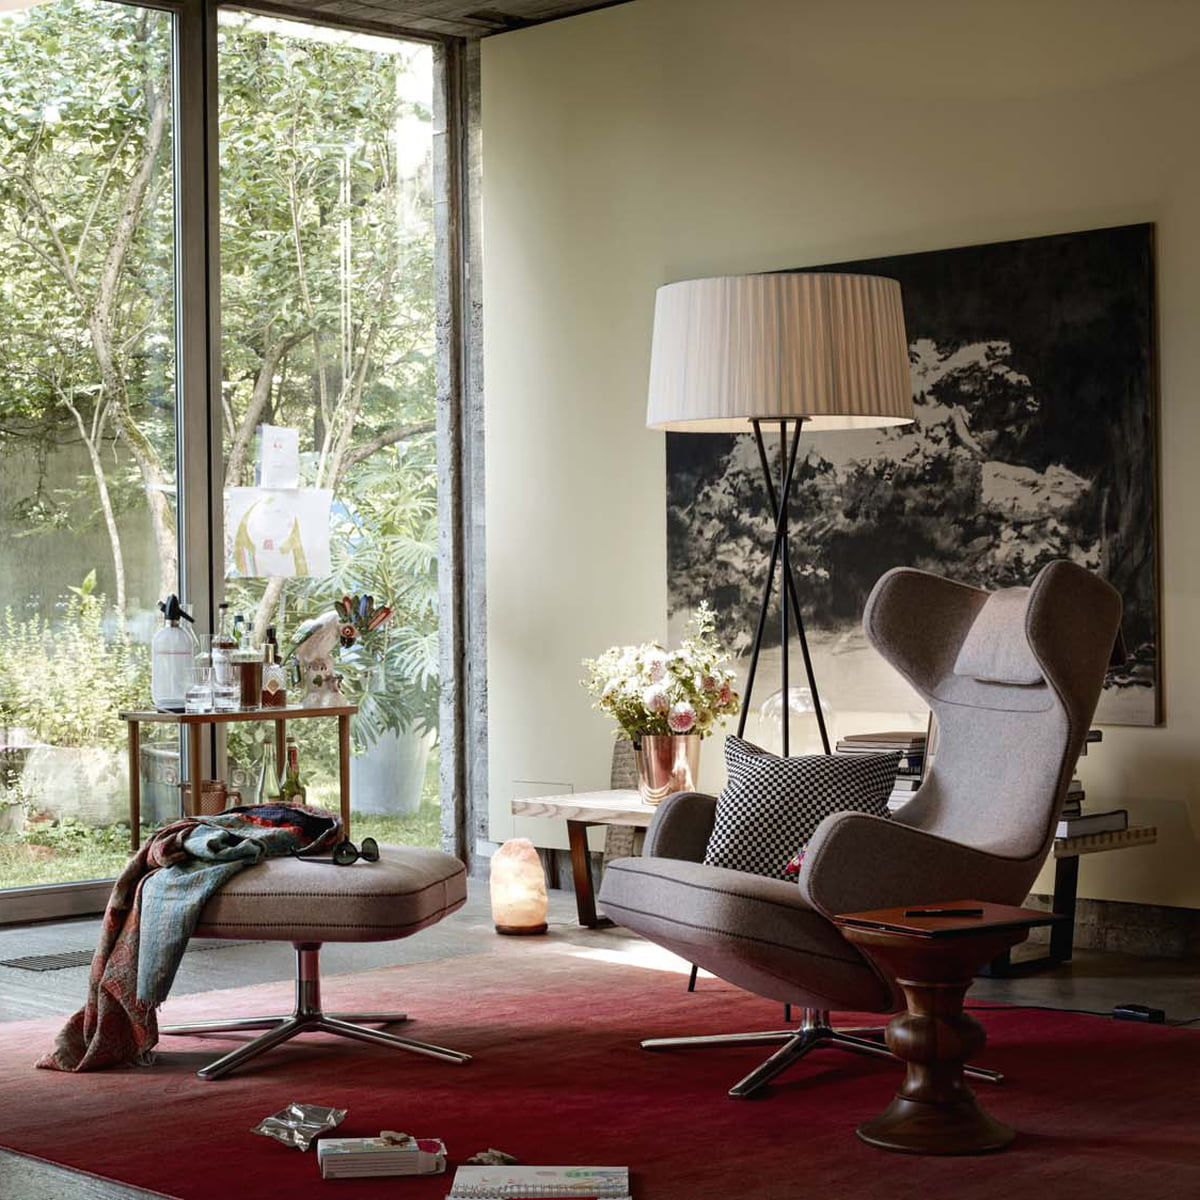 grand repos vitra shop. Black Bedroom Furniture Sets. Home Design Ideas